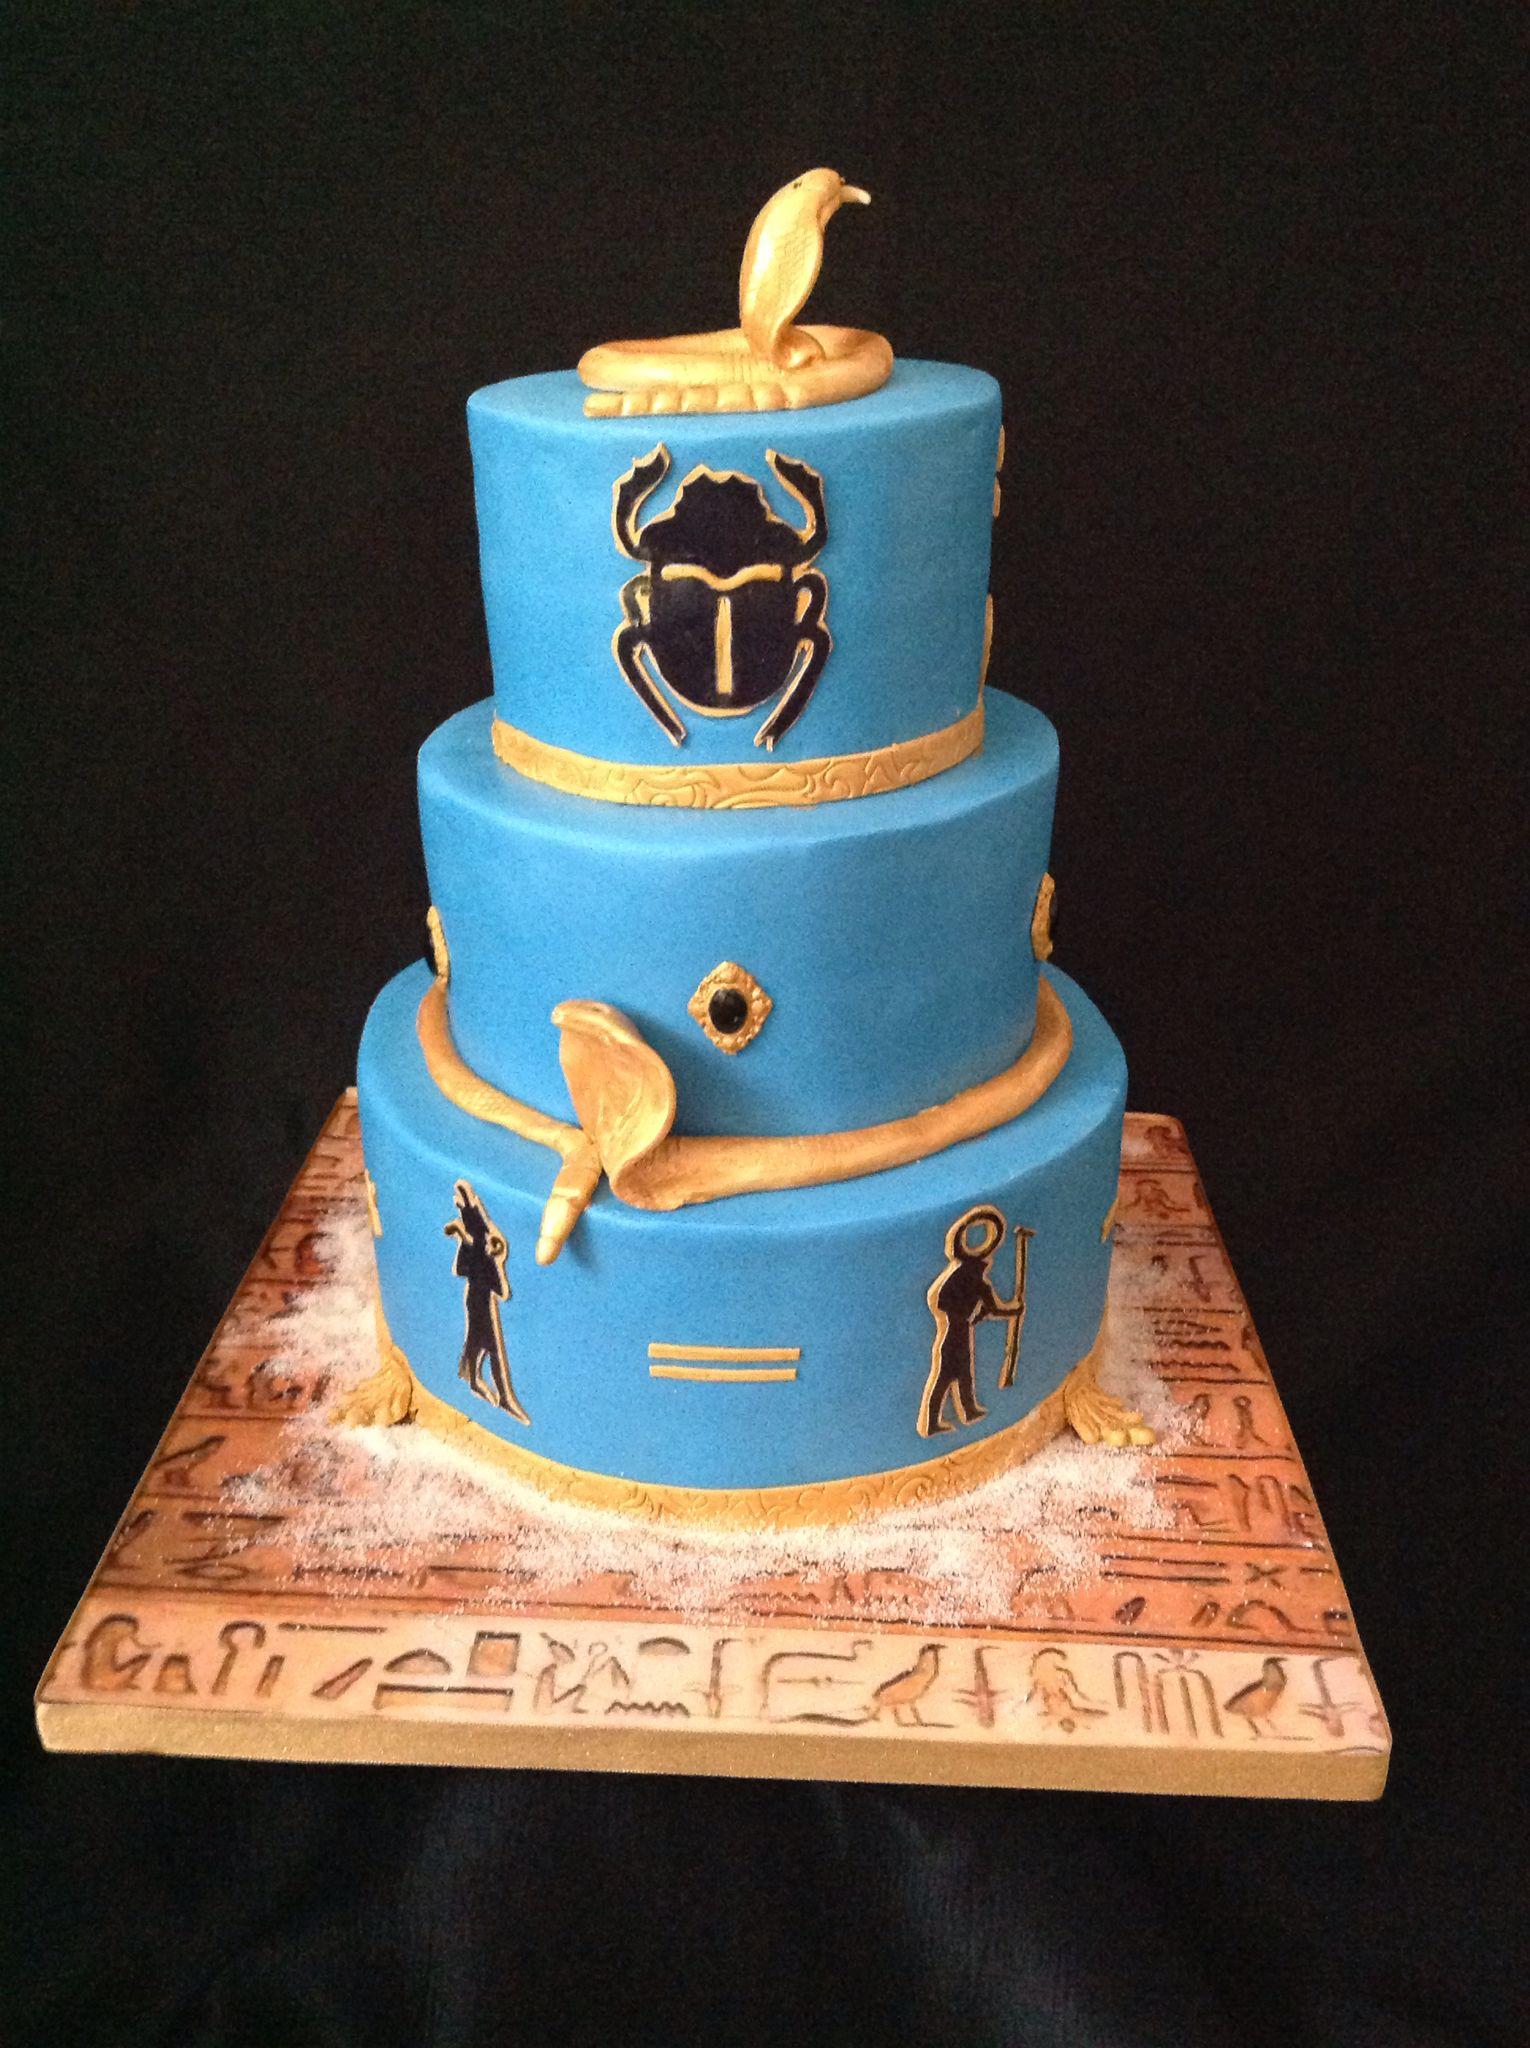 Enjoyable Three Tier Egyptian Theme Birthday Cake Cake Novelty Cakes Funny Birthday Cards Online Necthendildamsfinfo